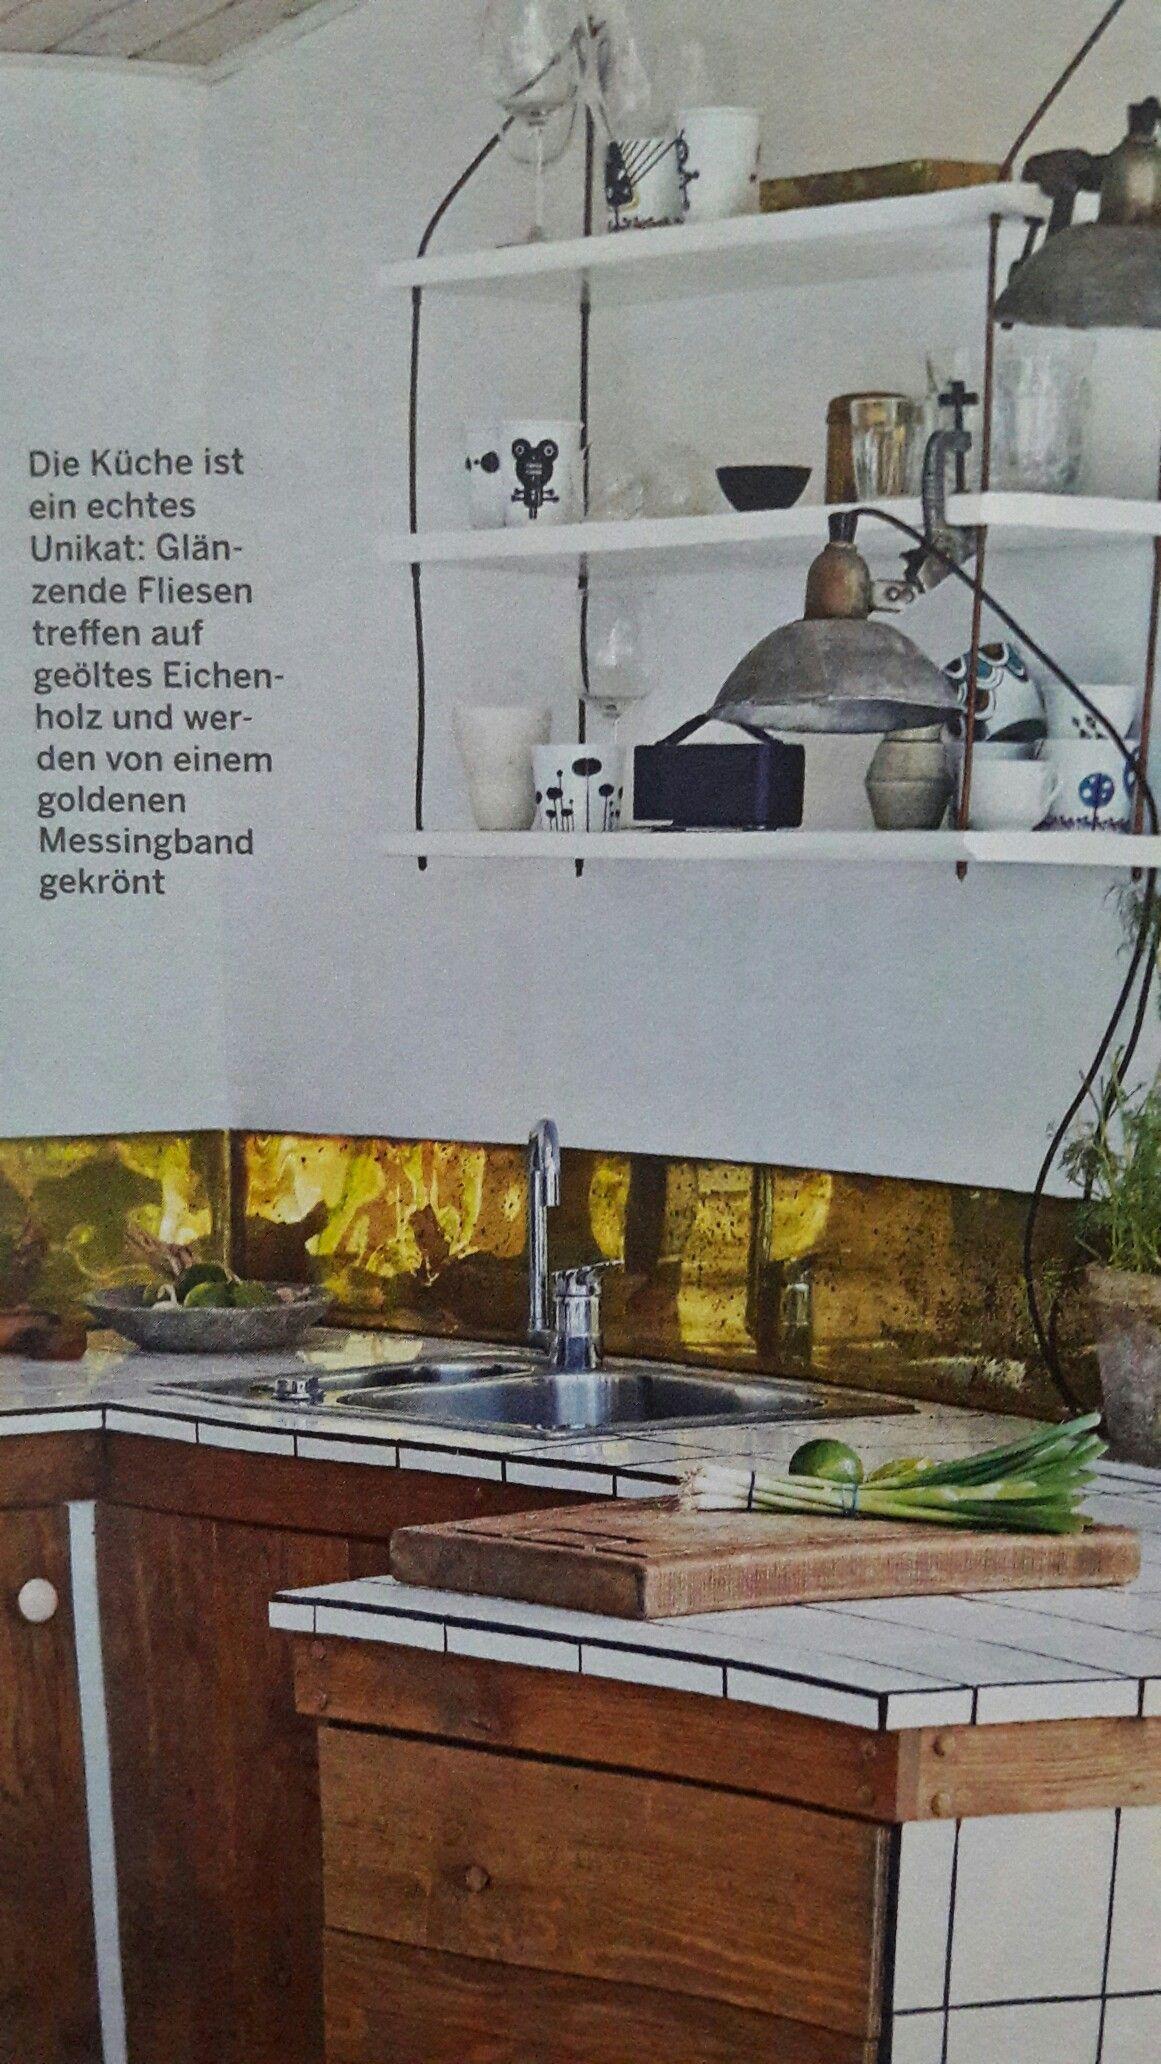 Messing Band als spritzschutz   Spritzschutz Küche   Pinterest ...